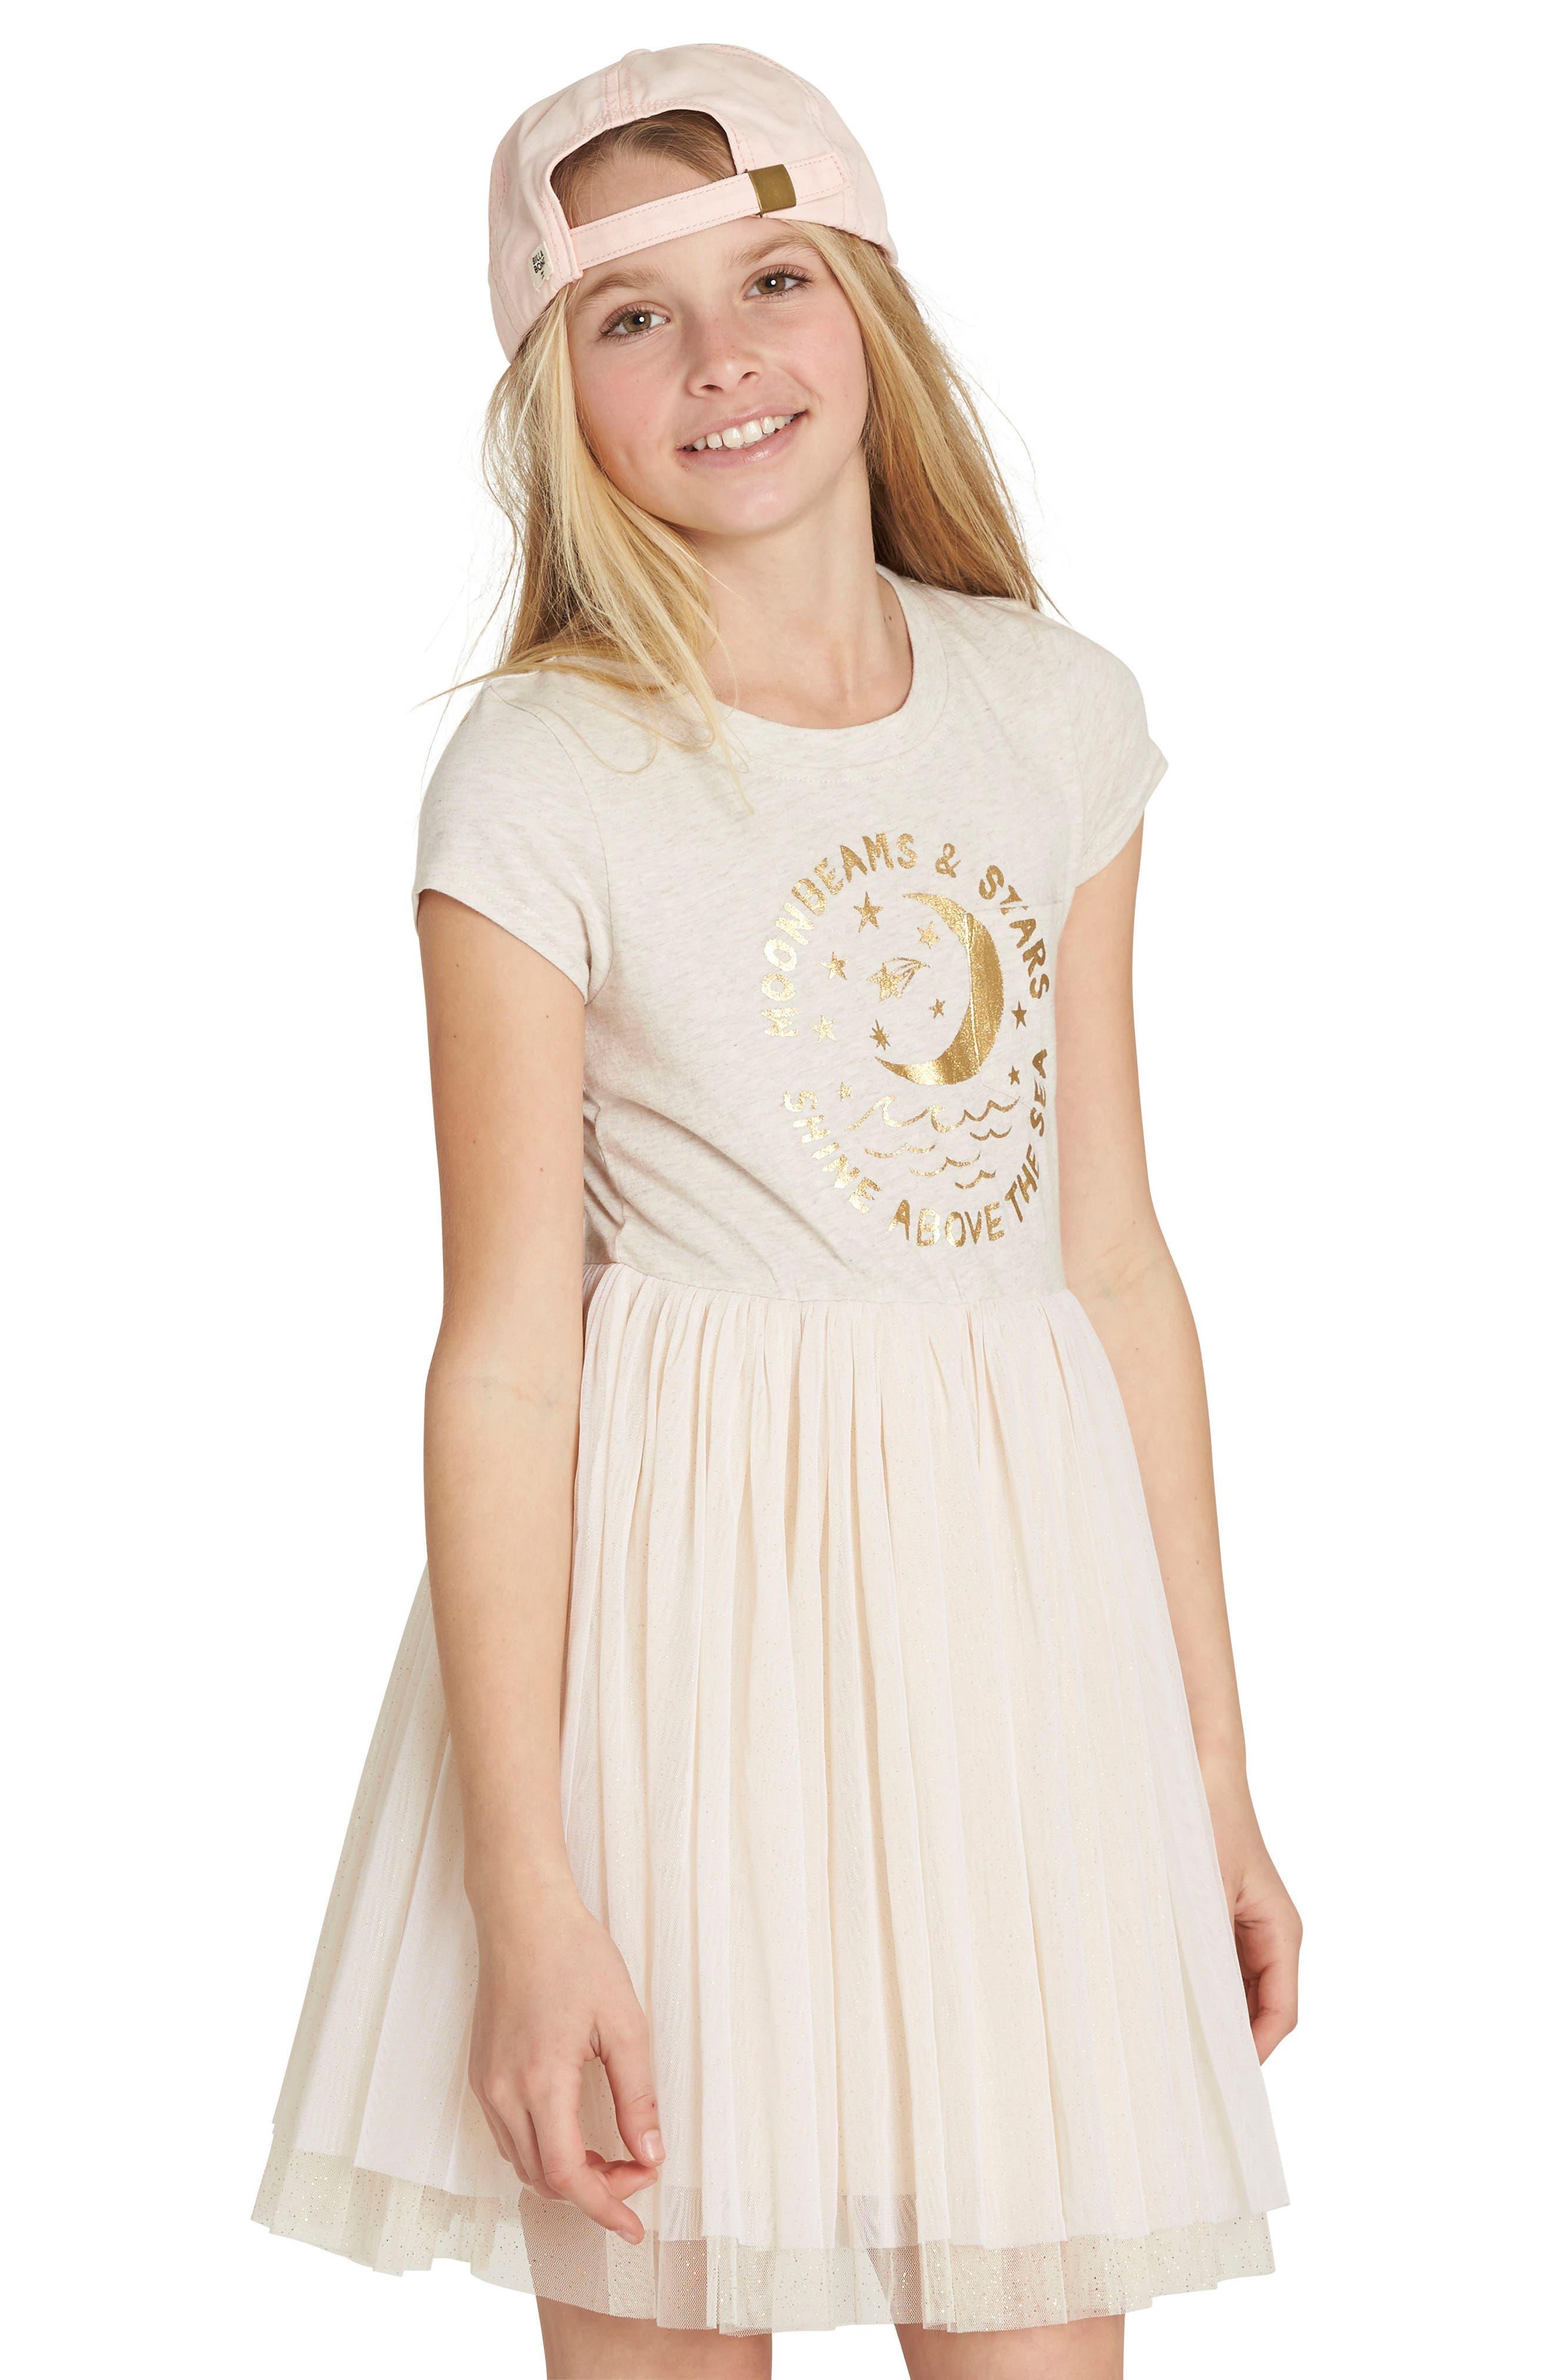 Alternate Image 1 Selected - Billabong Sunkissed Nights Mixed Media Dress (Little Girls & Big Girls)